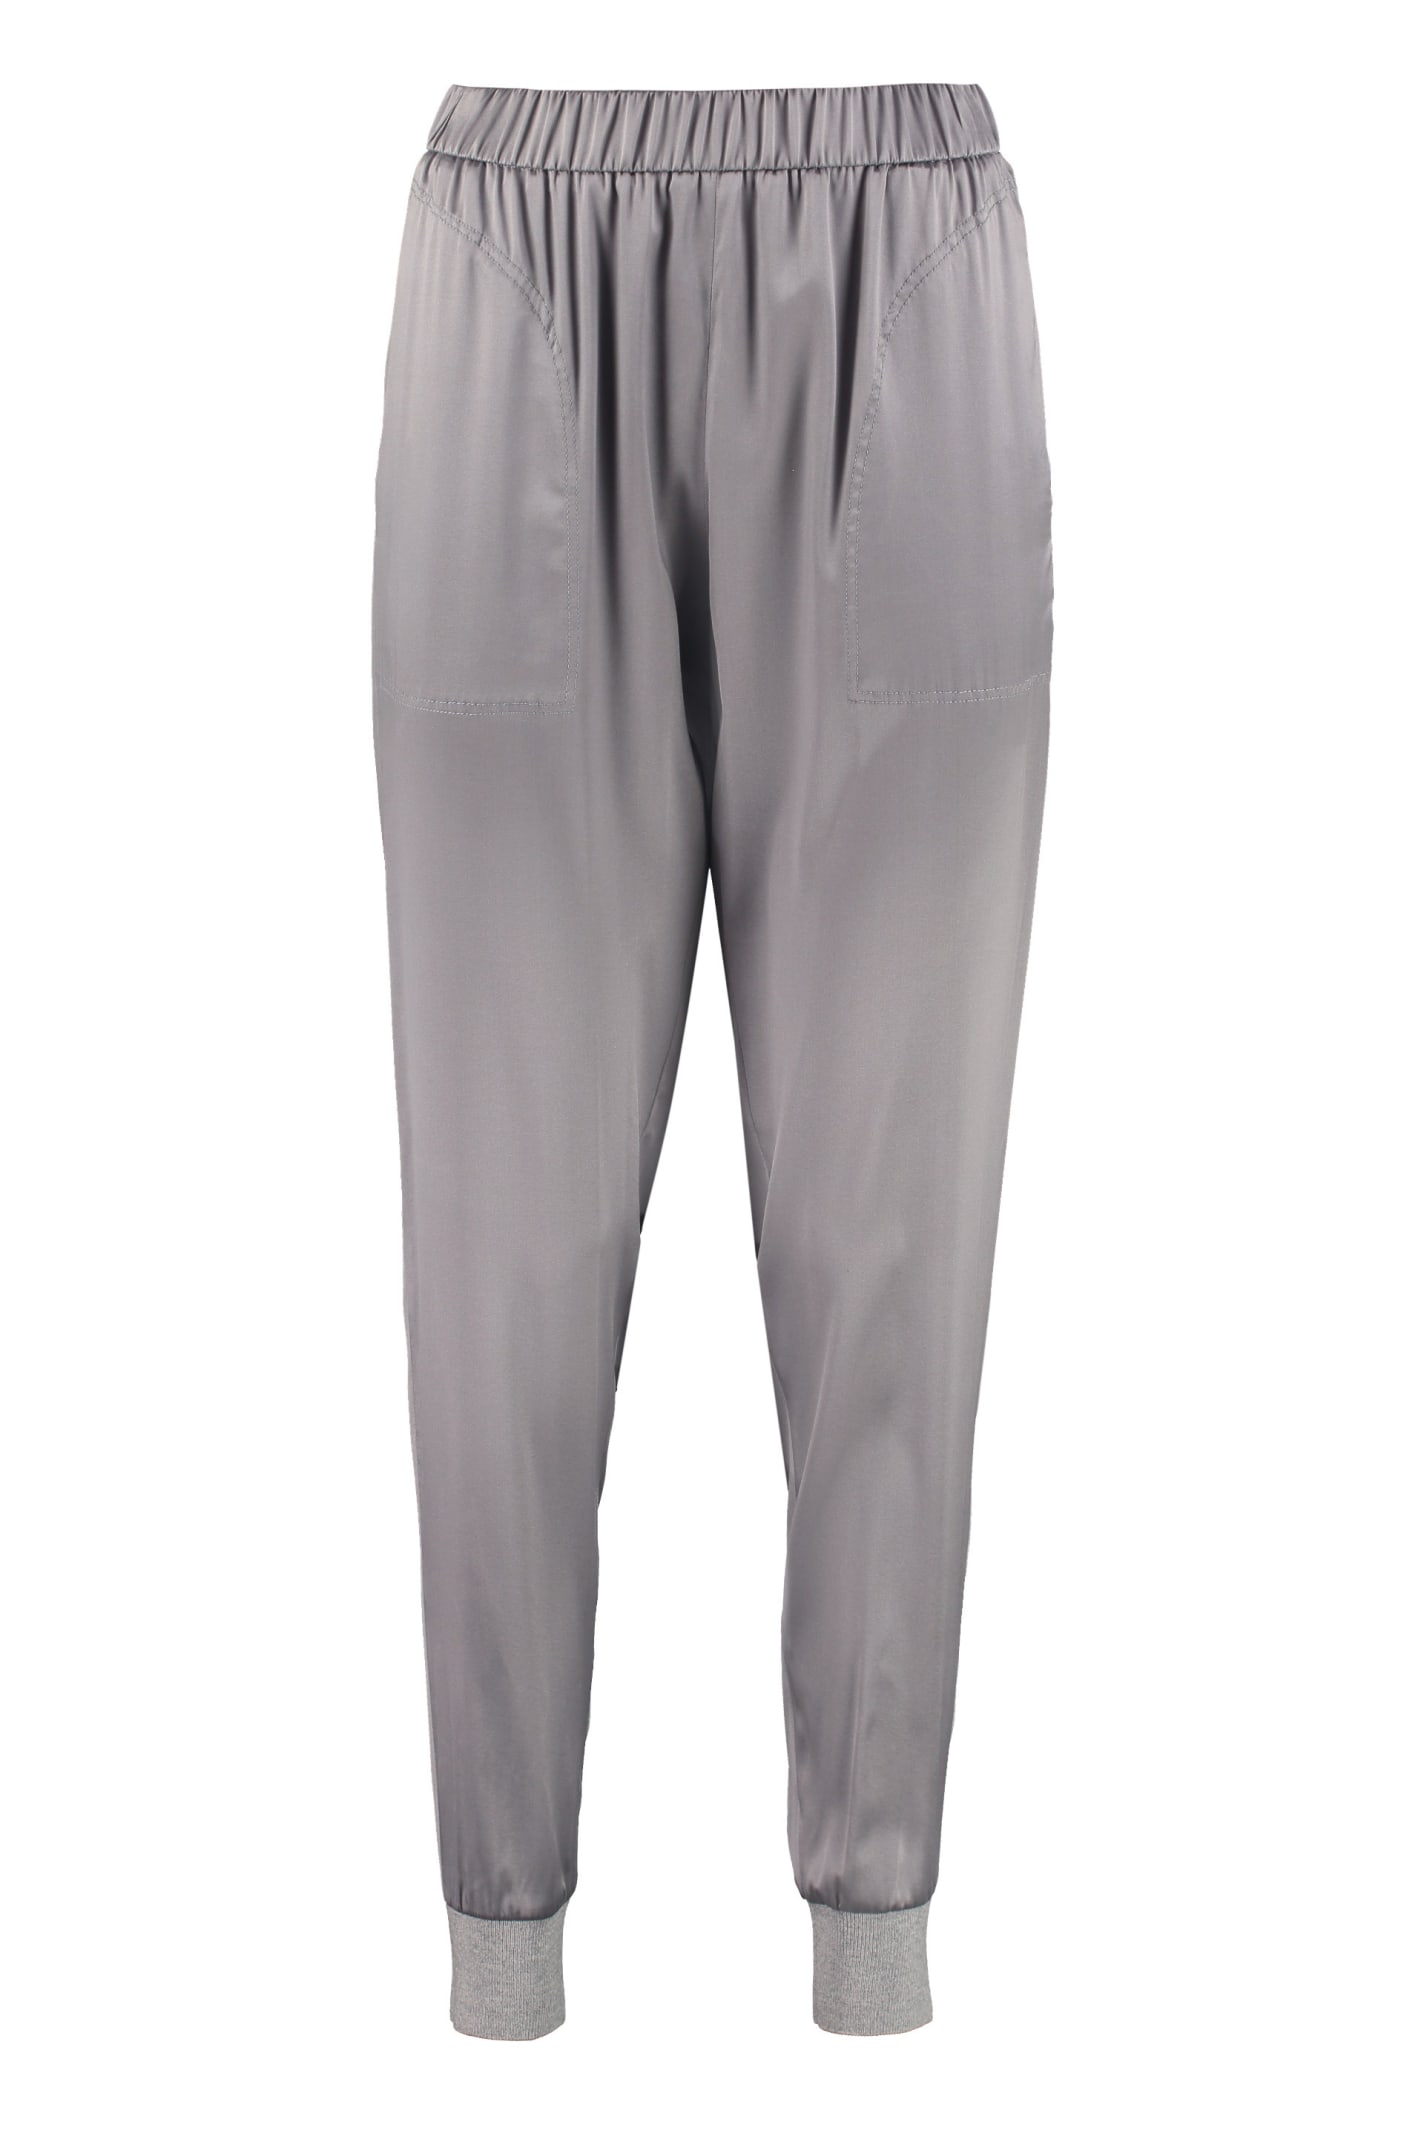 Fabiana Filippi Stretch Satin Trousers